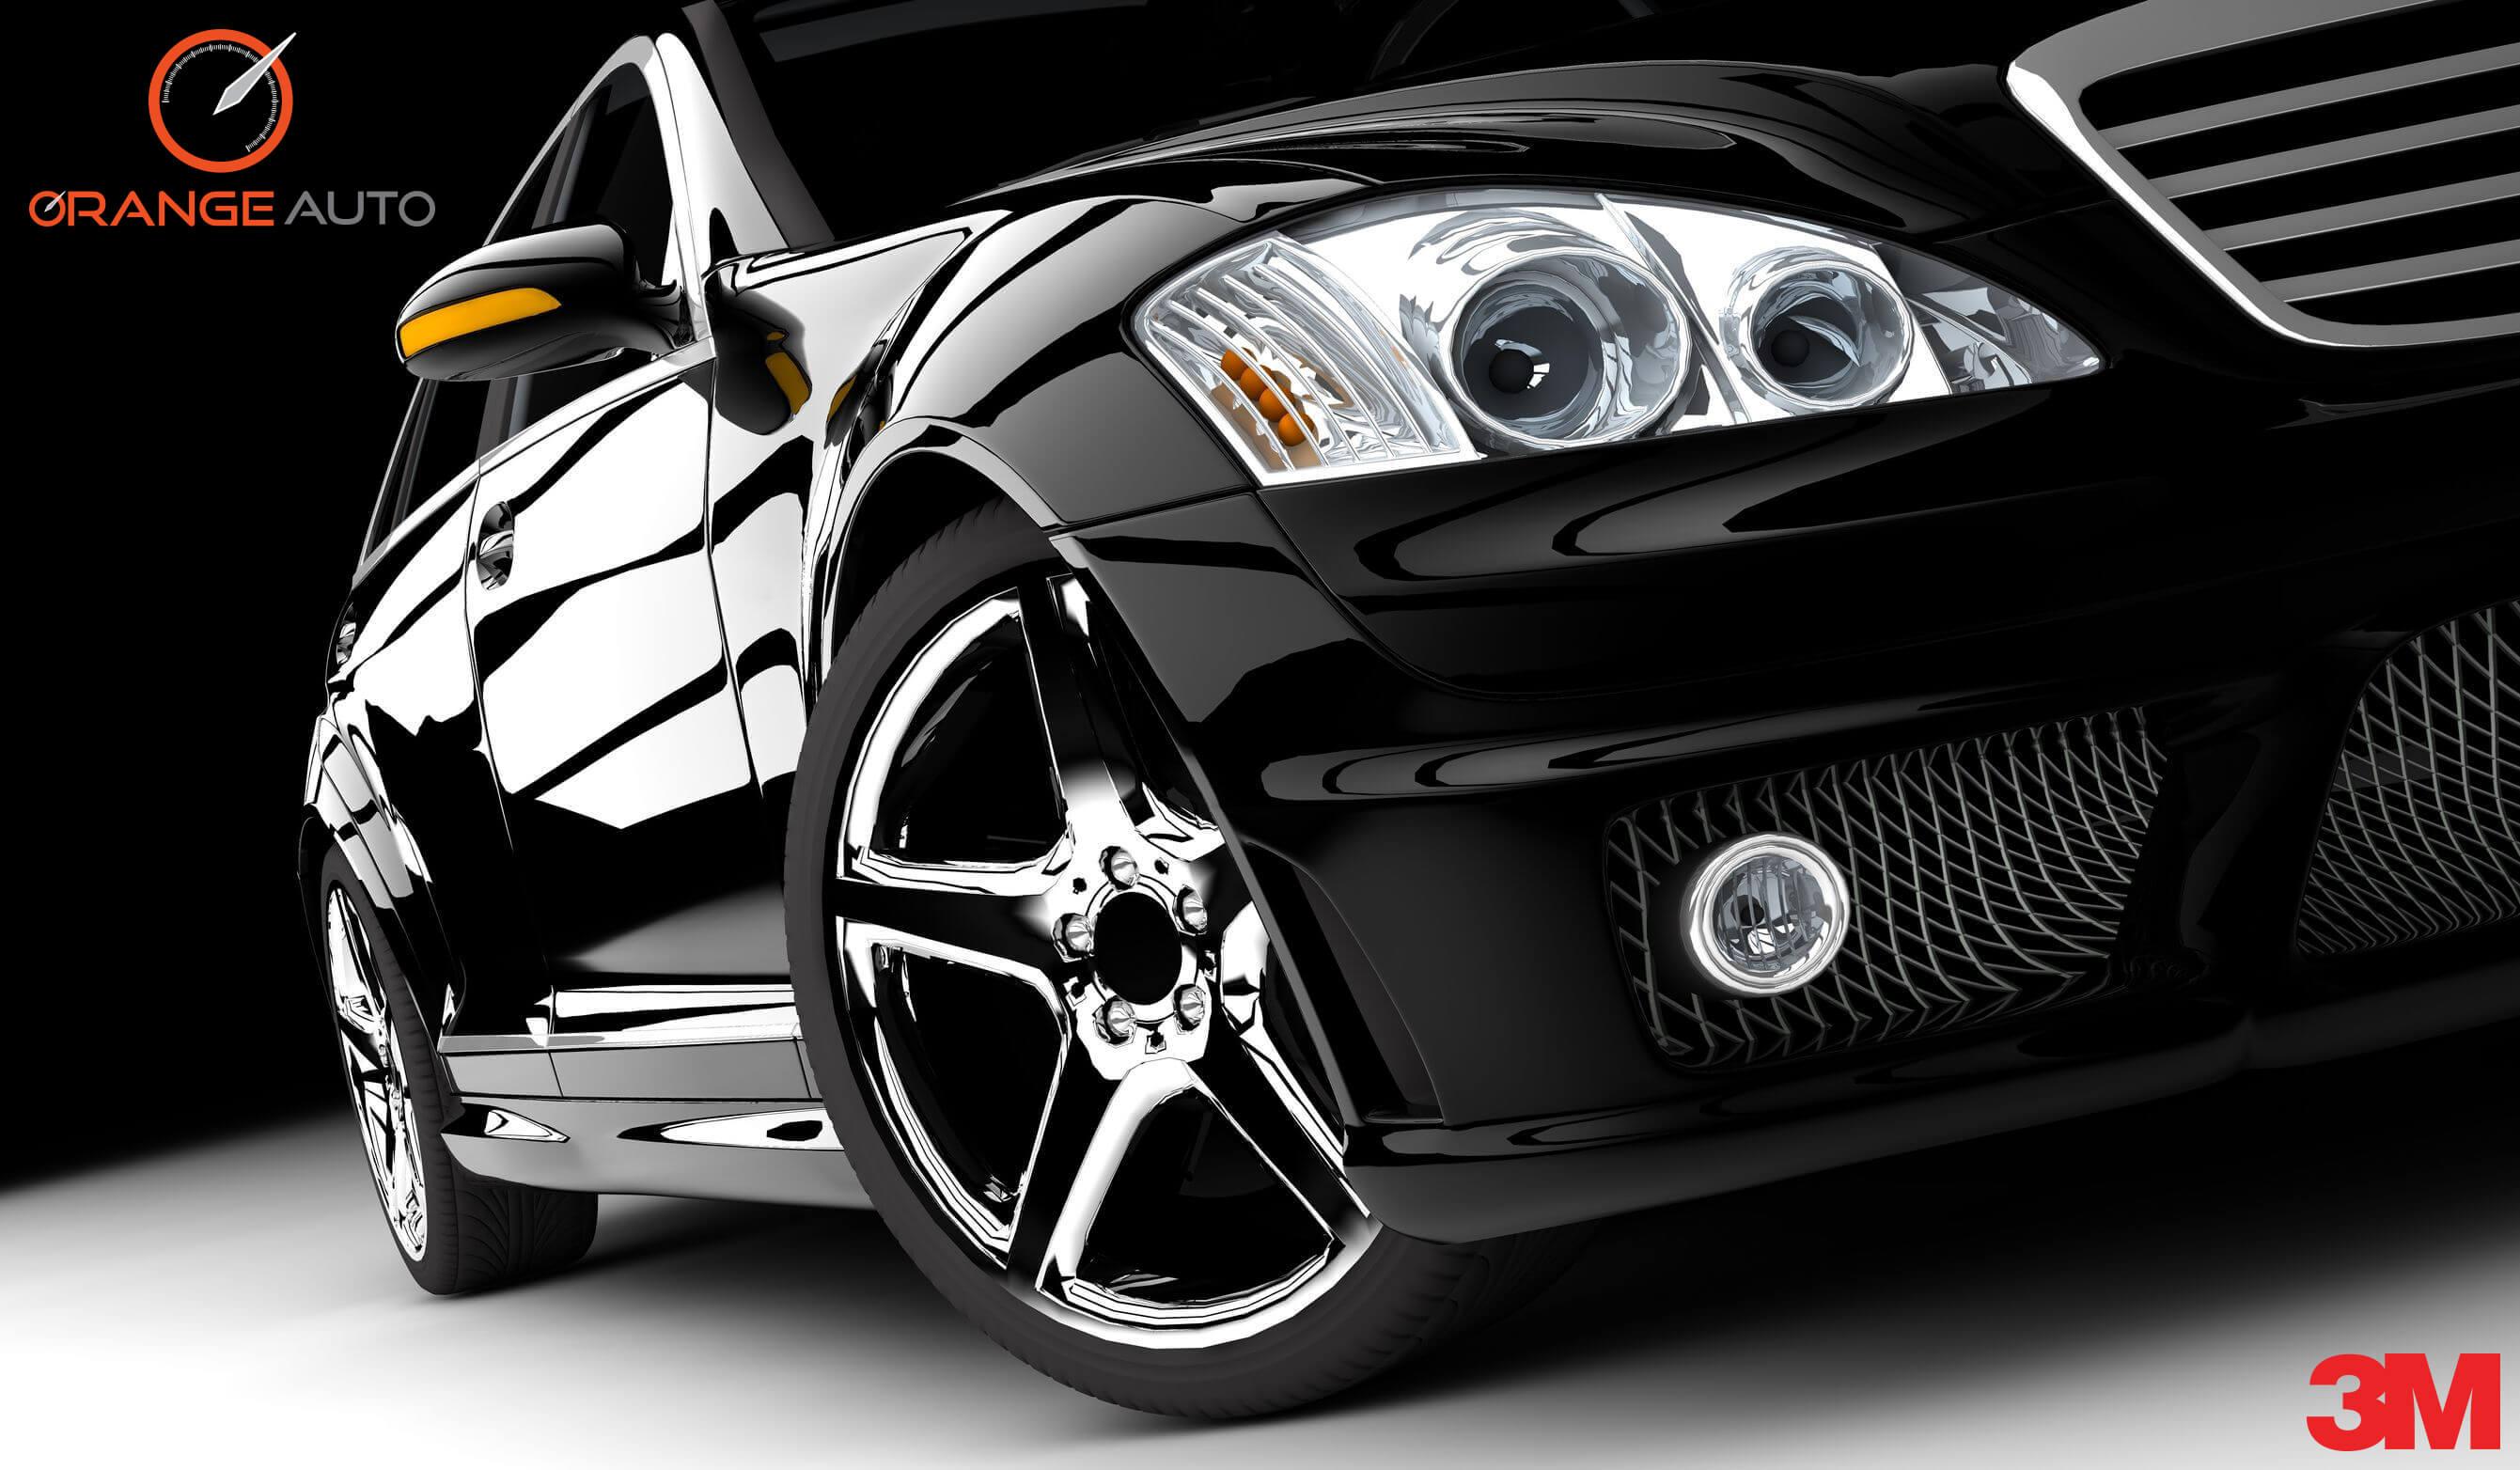 3M Car Detailing